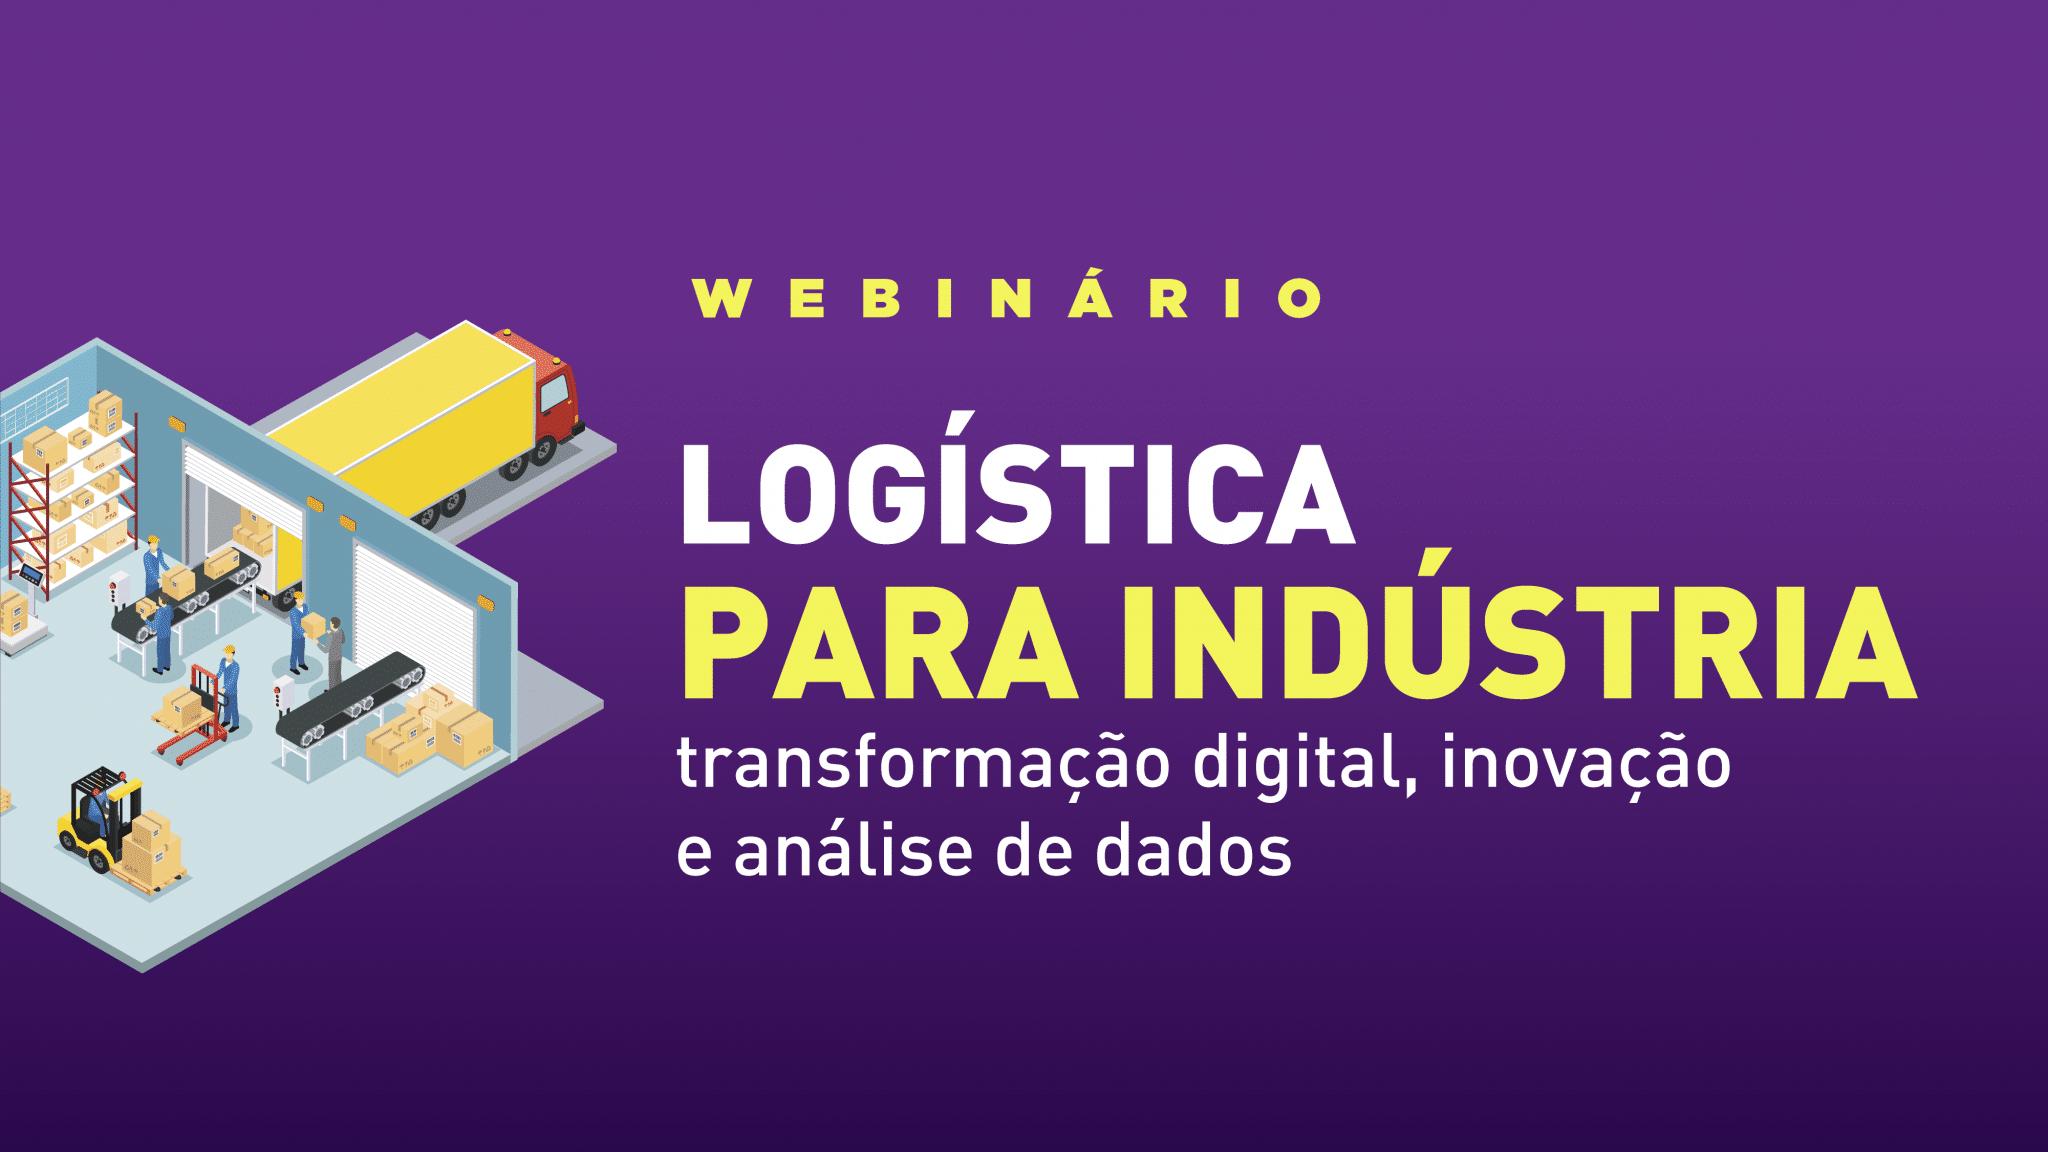 Webinário Logístico para Indústria